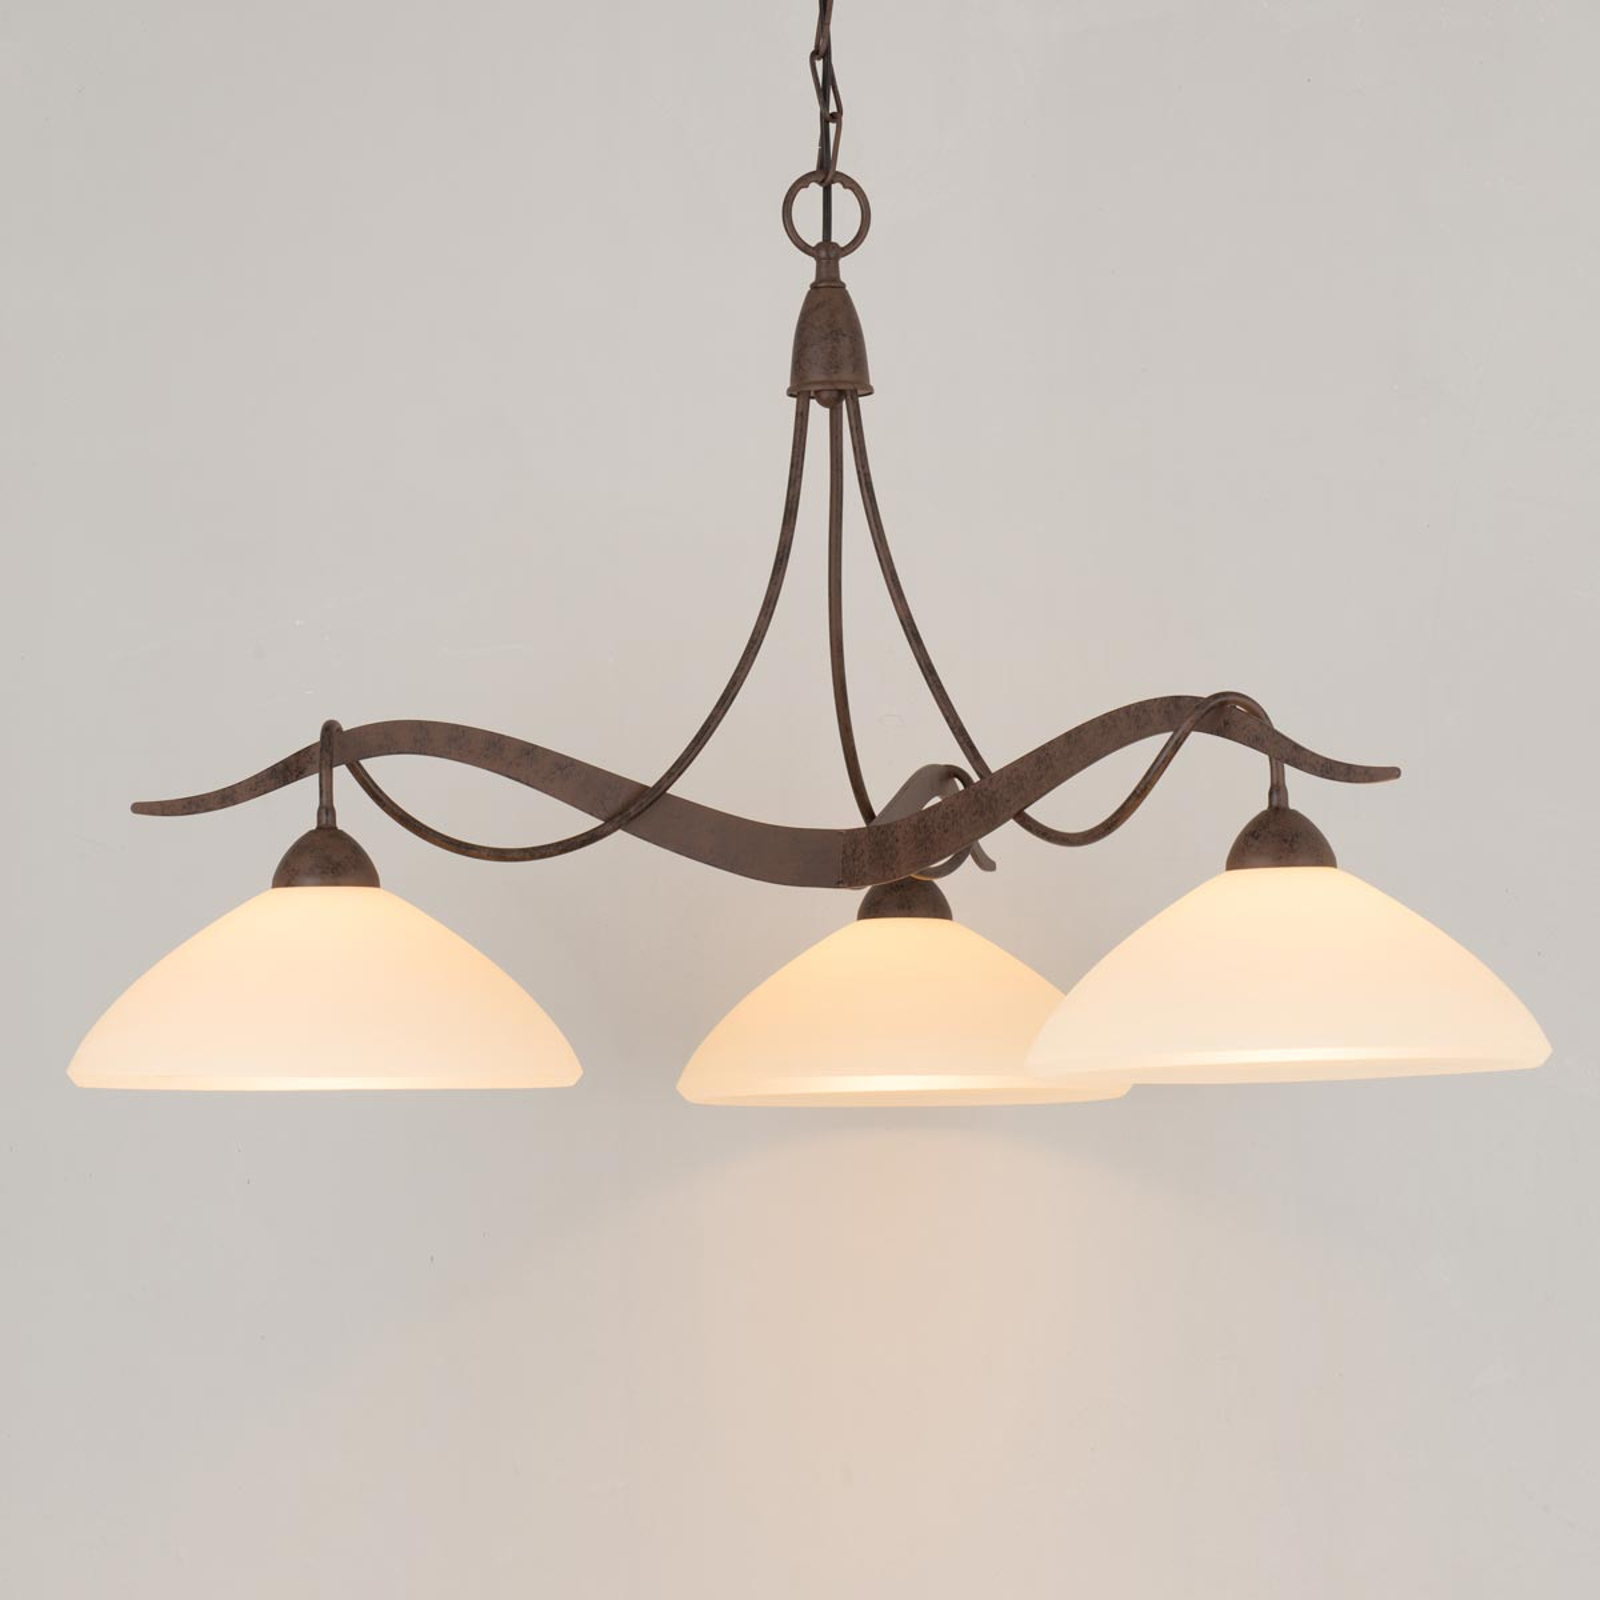 Riippuvalaisin Samuele 3-lampp. krema